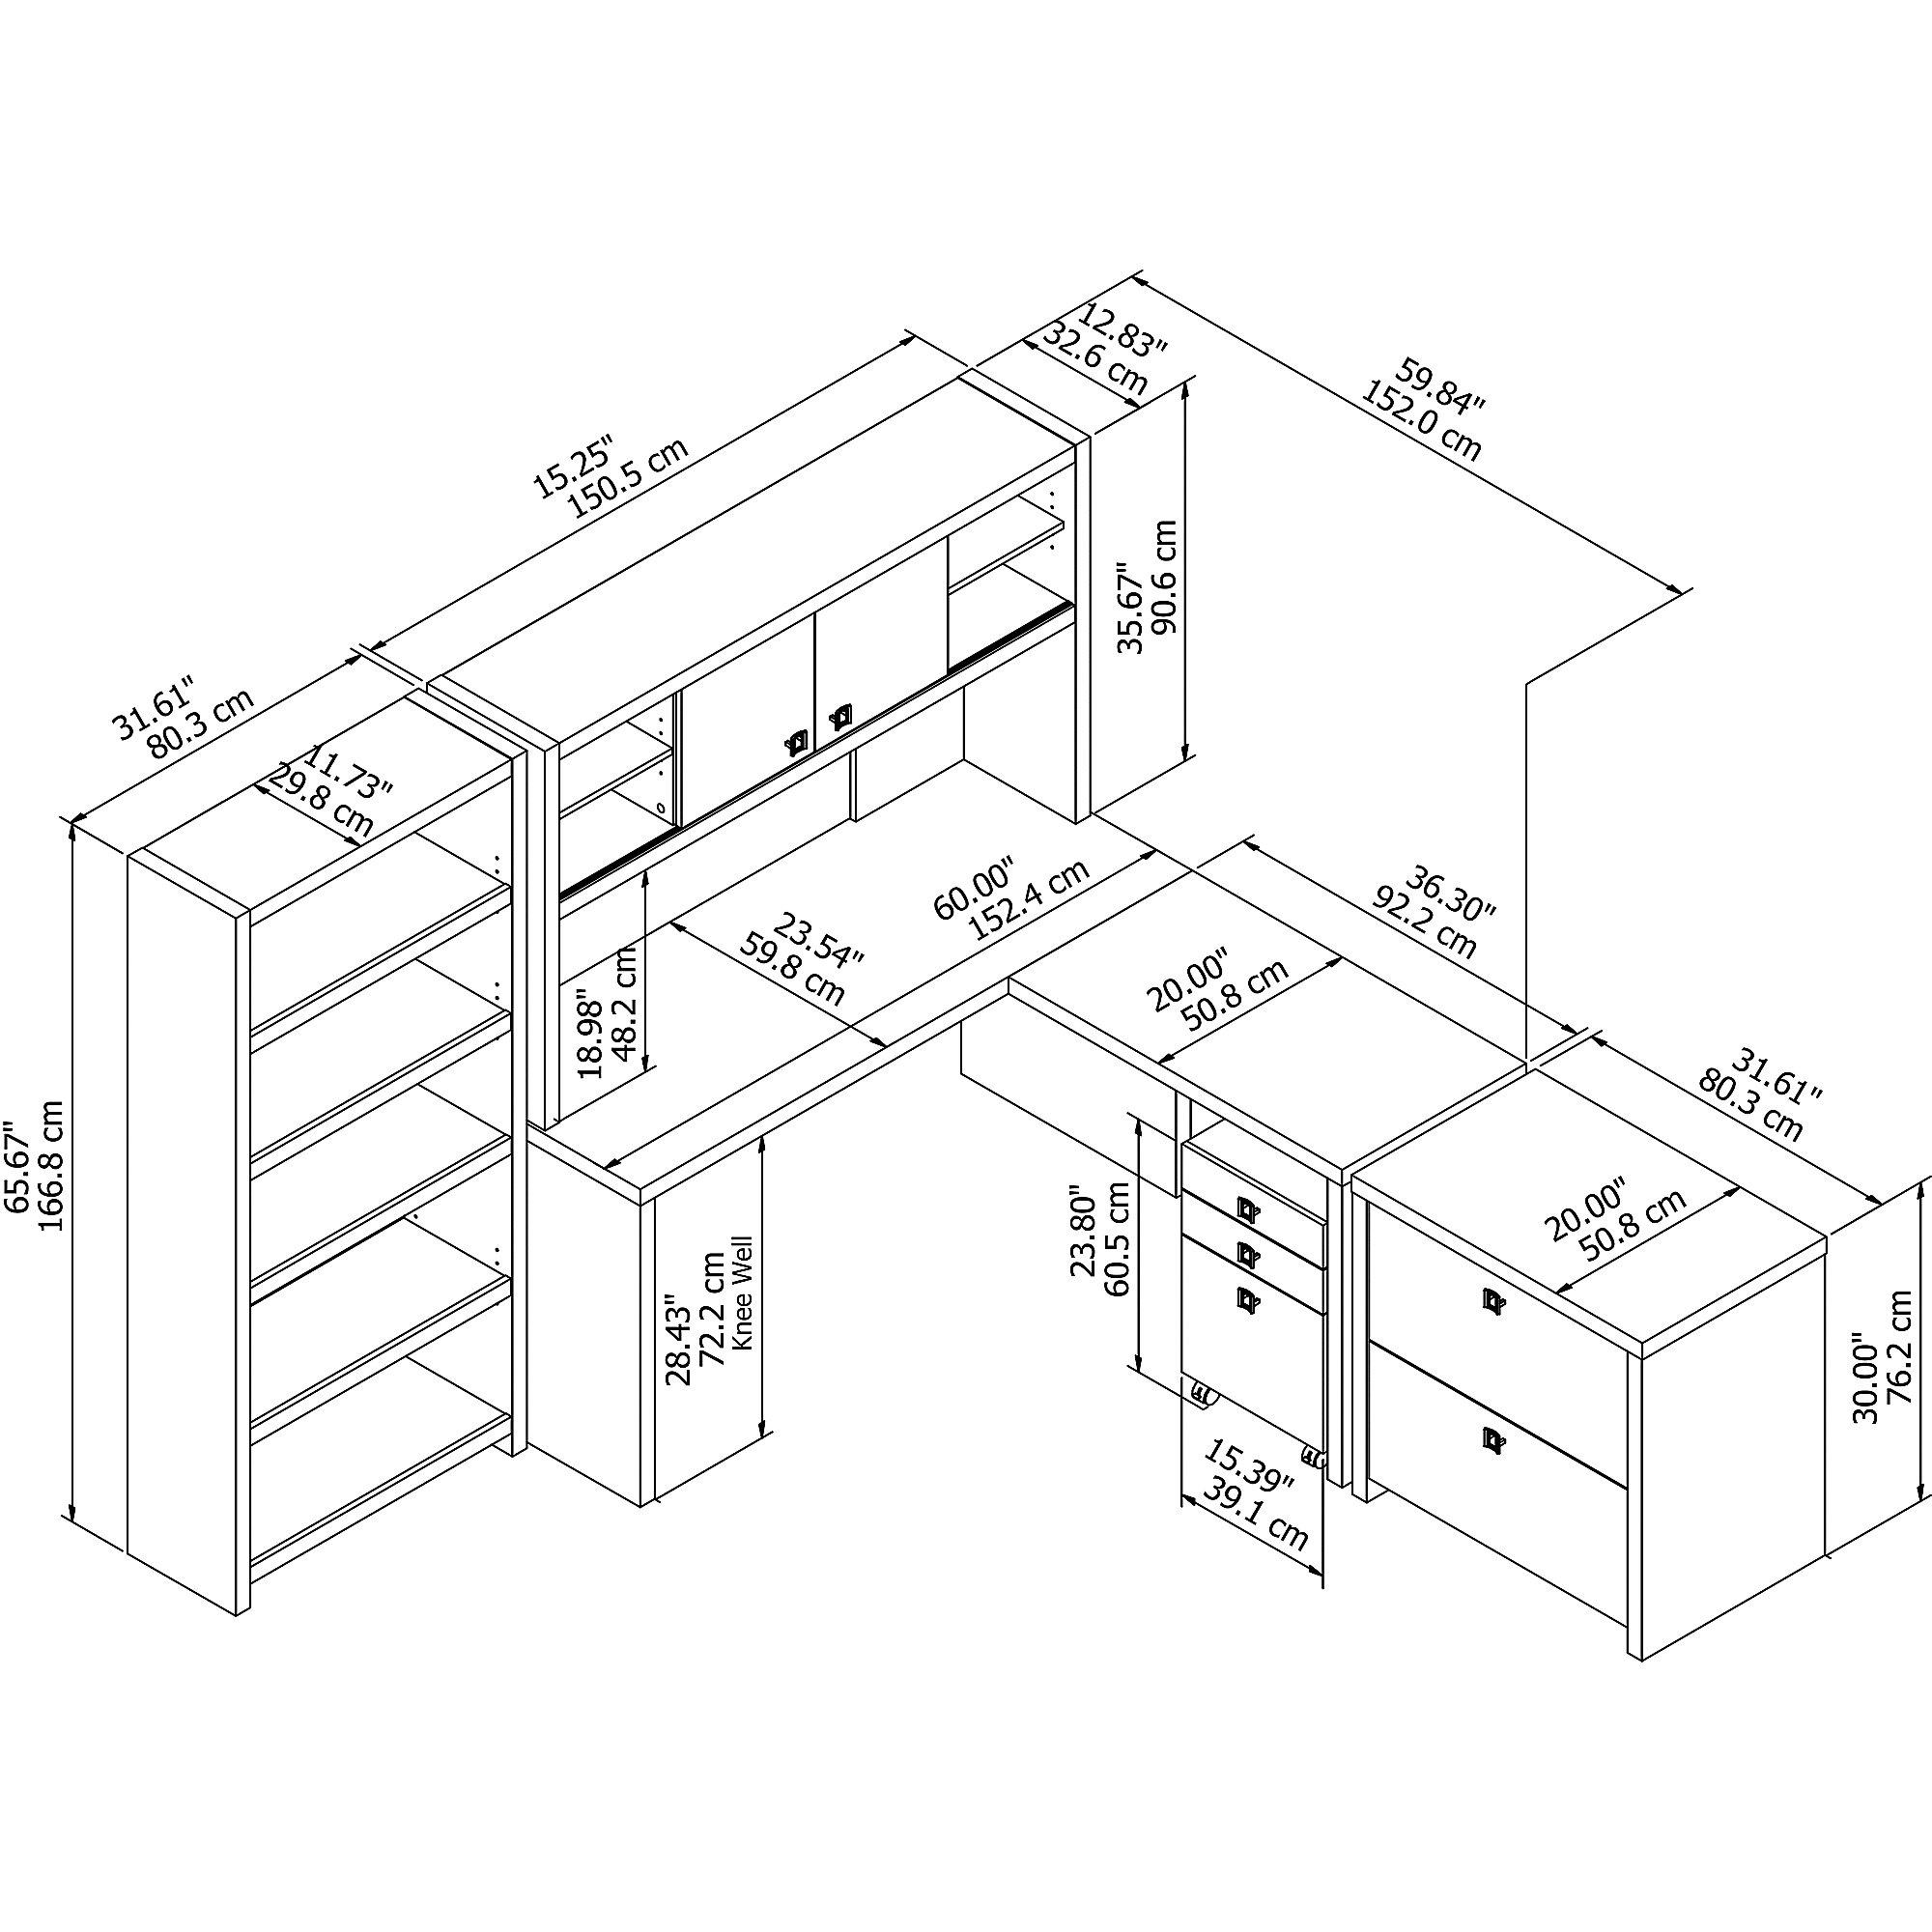 ech028 echo desk dimensions